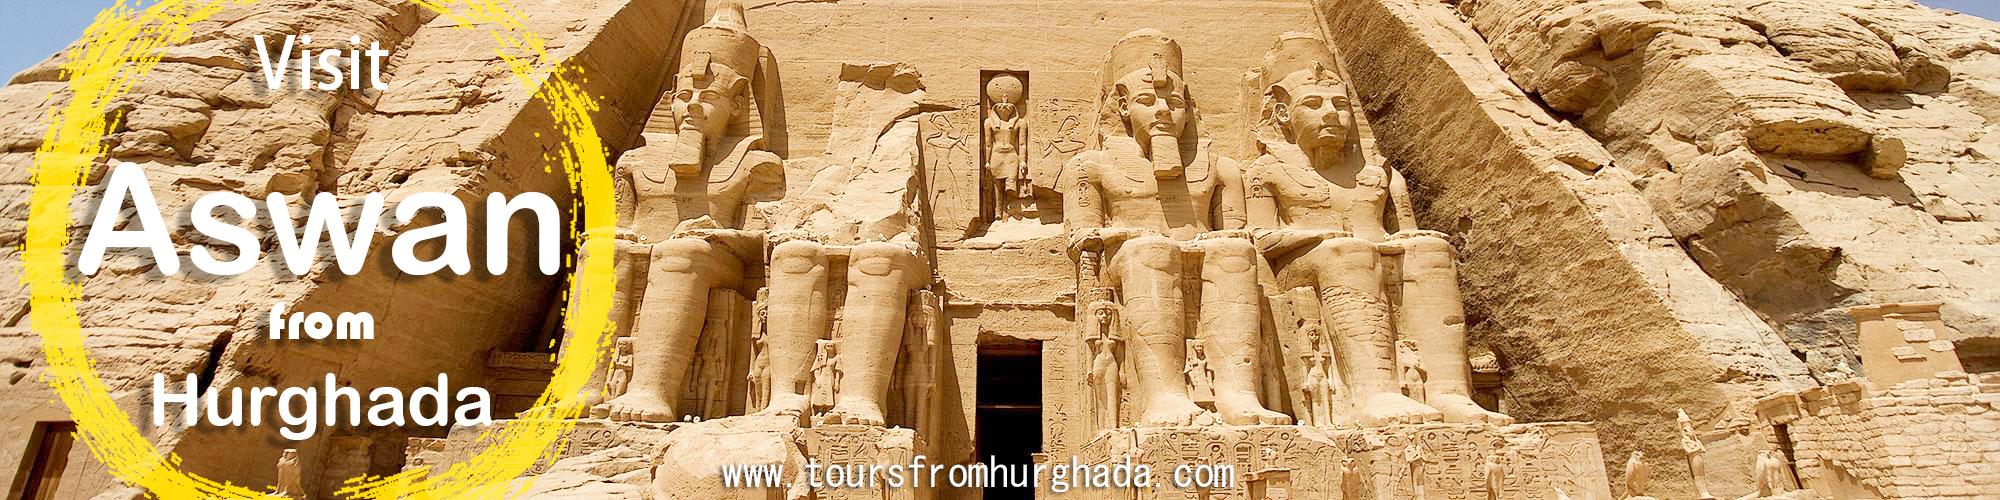 Trips from Hurghada to Aswan ToursFromHurghada